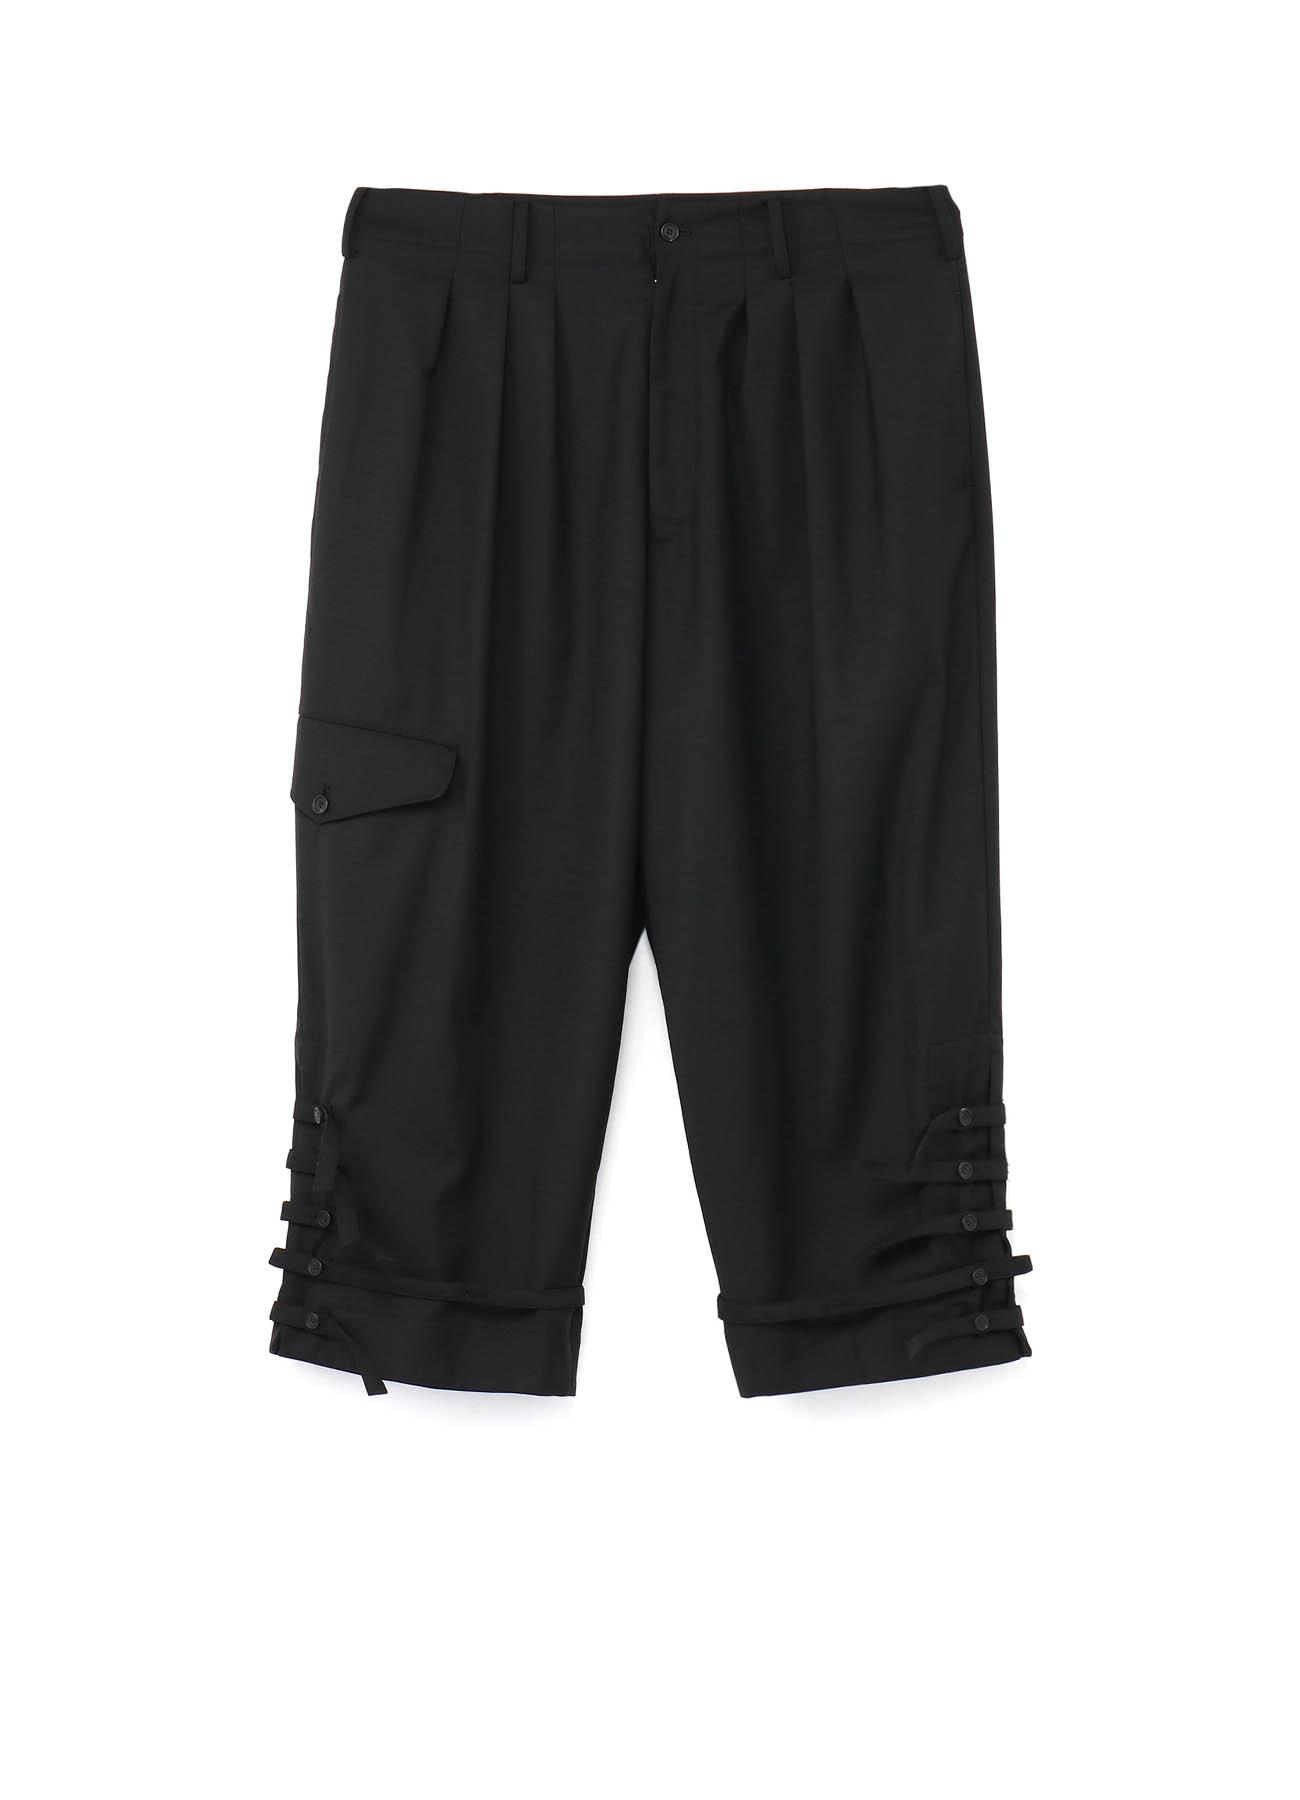 T/W Gabardine 3Tuck 5Loop Cargo Pants